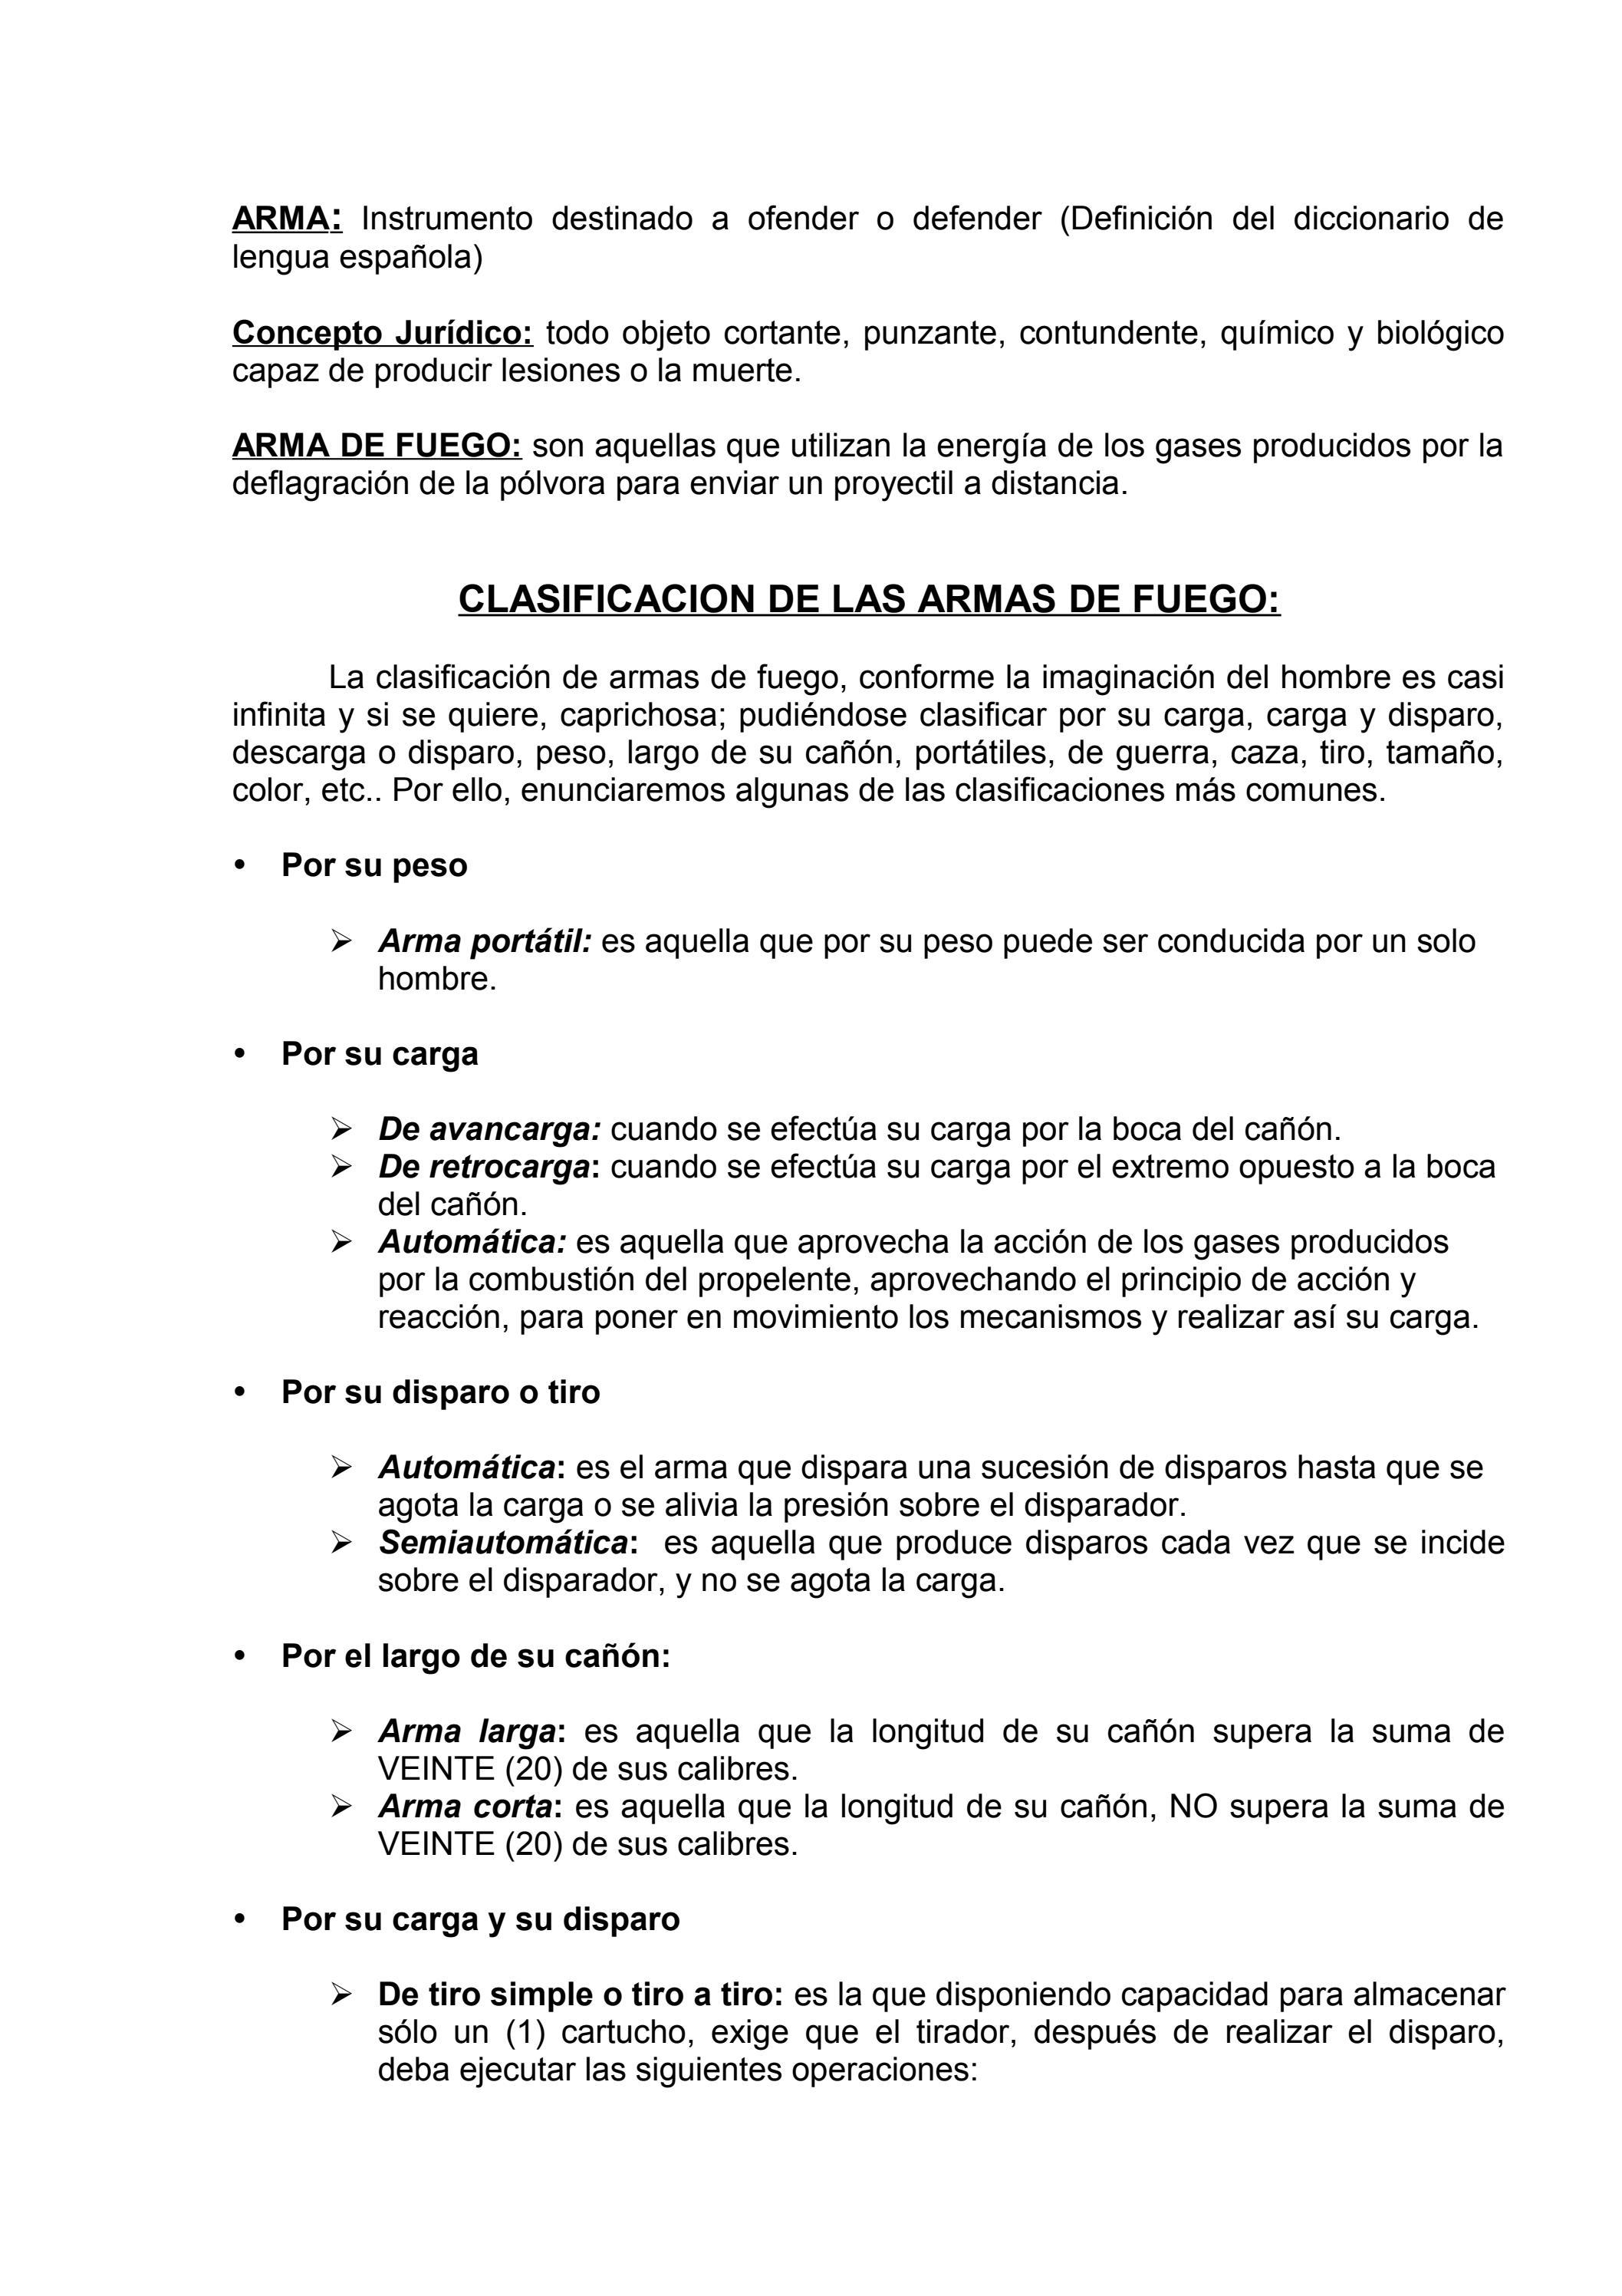 arma y tiro by Luis Miranda - issuu